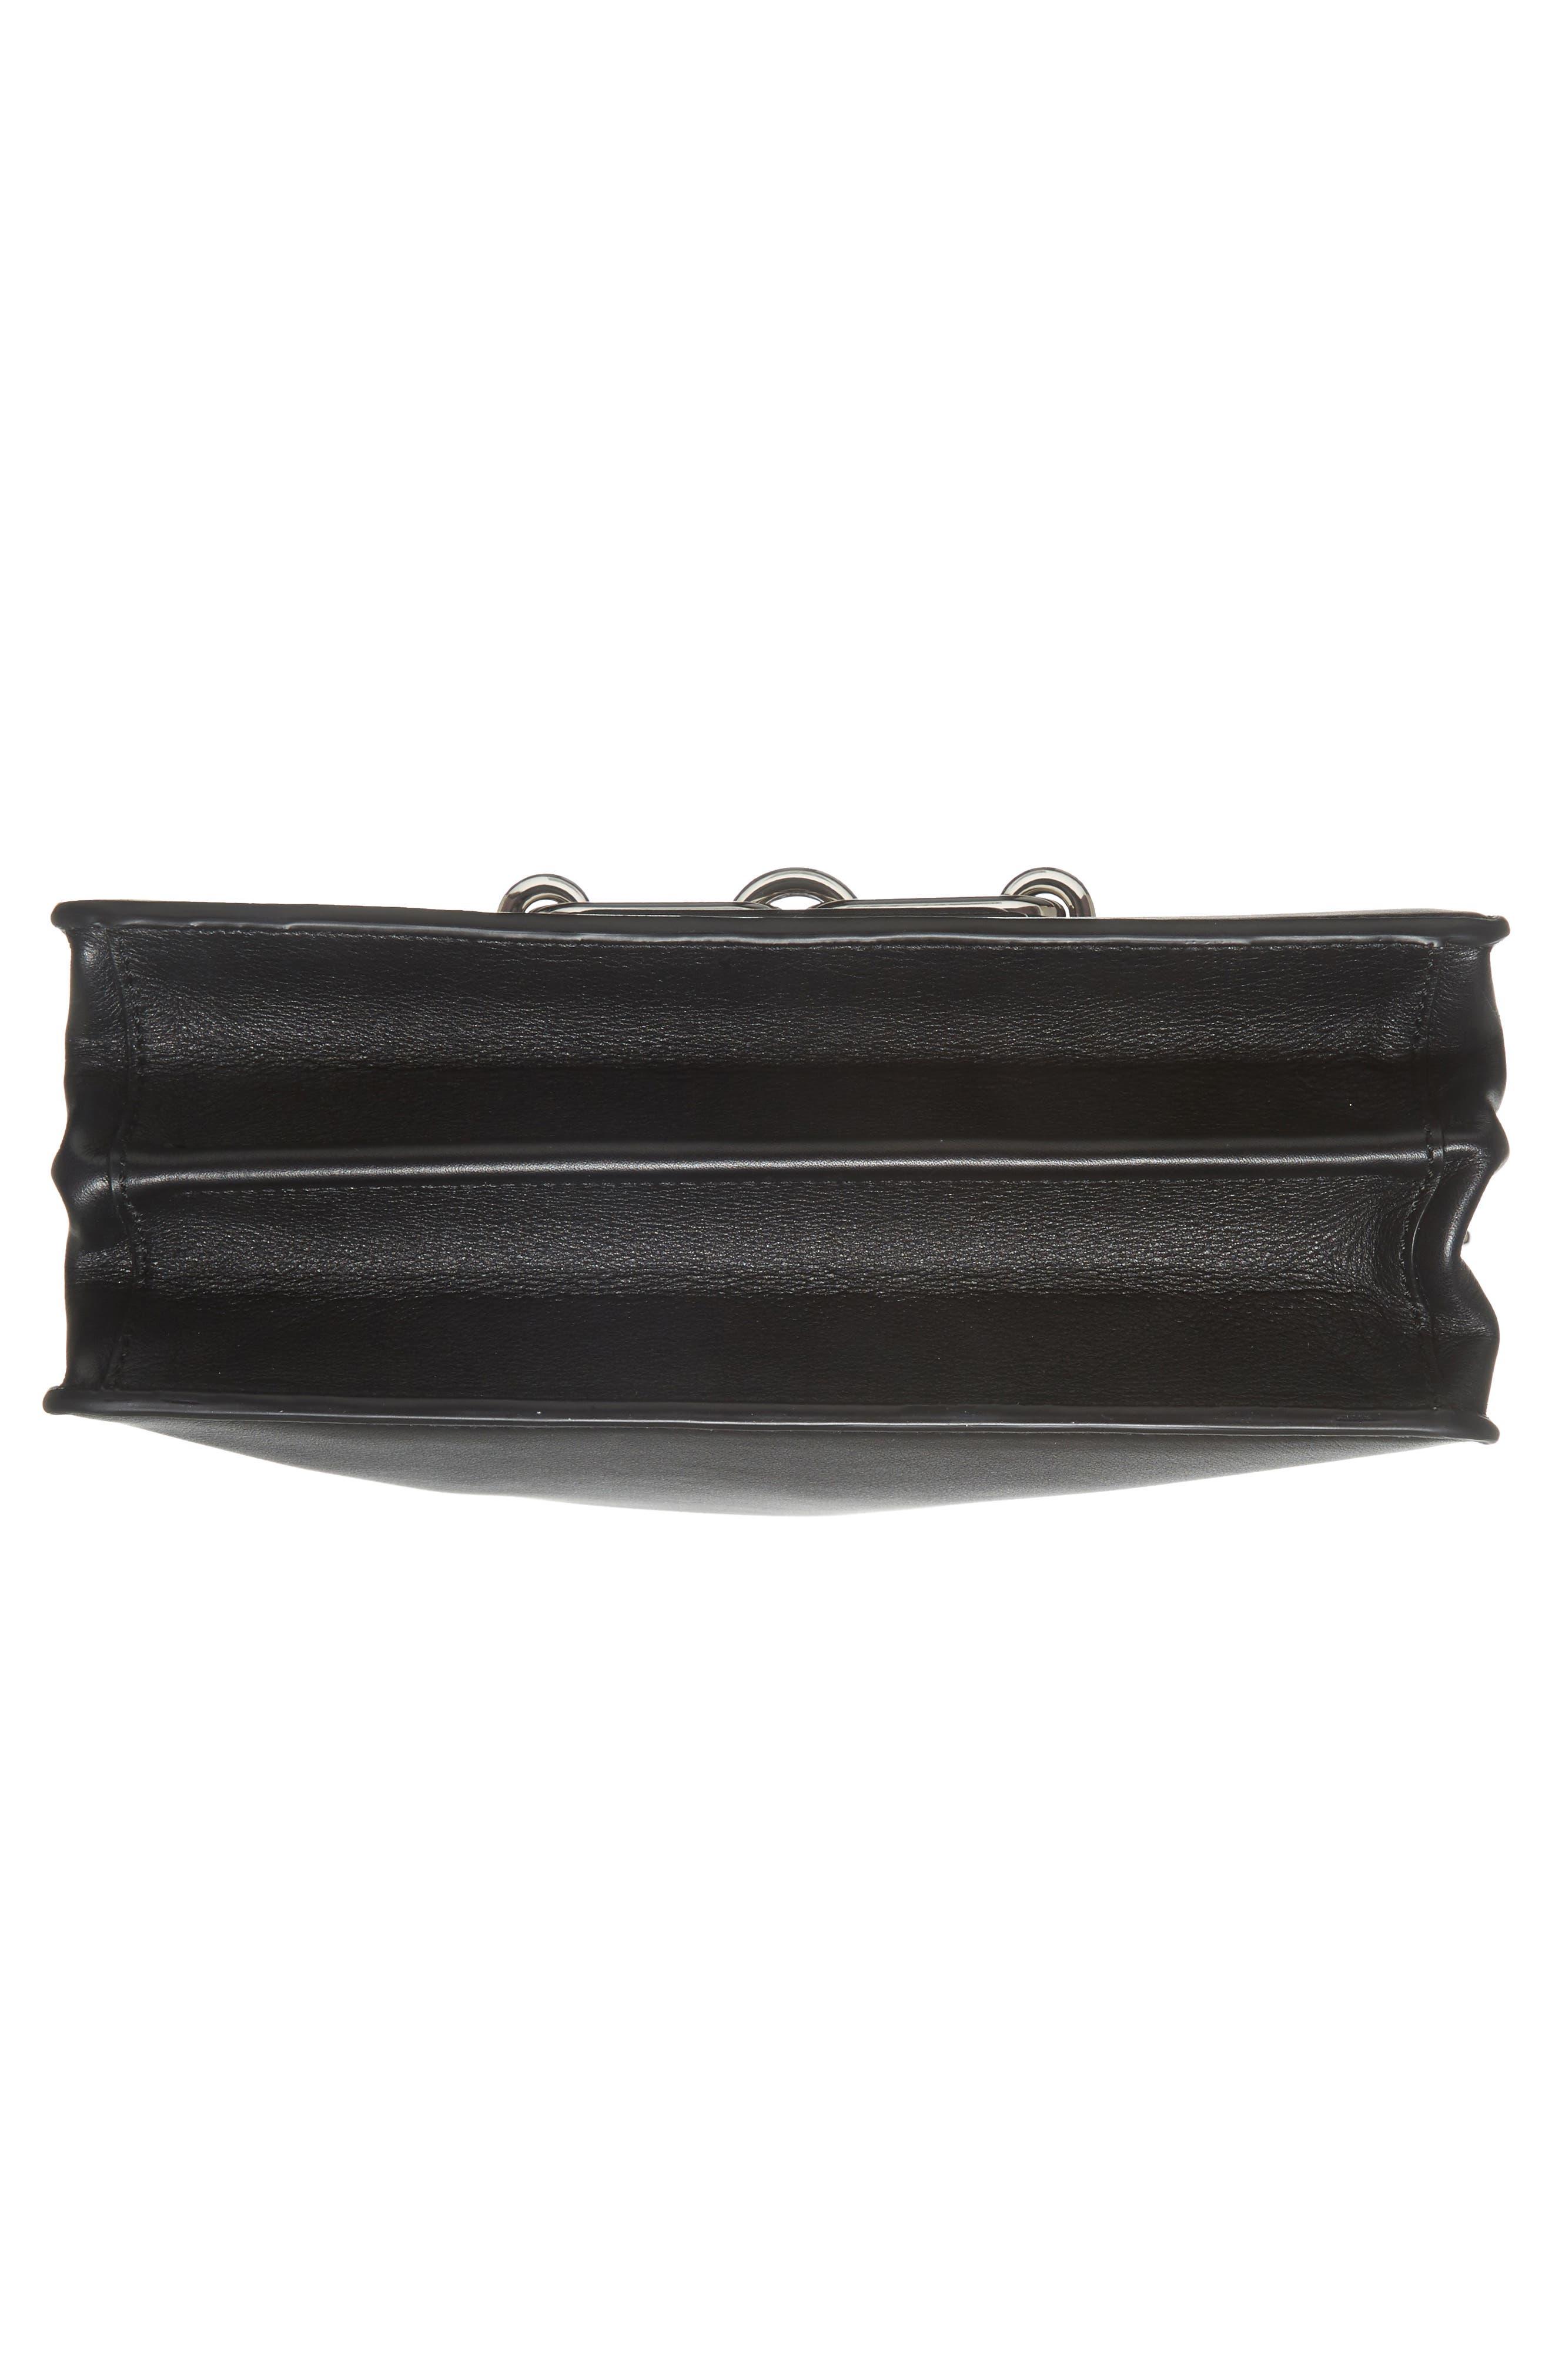 Medium Shoulder Bag,                             Alternate thumbnail 5, color,                             Black